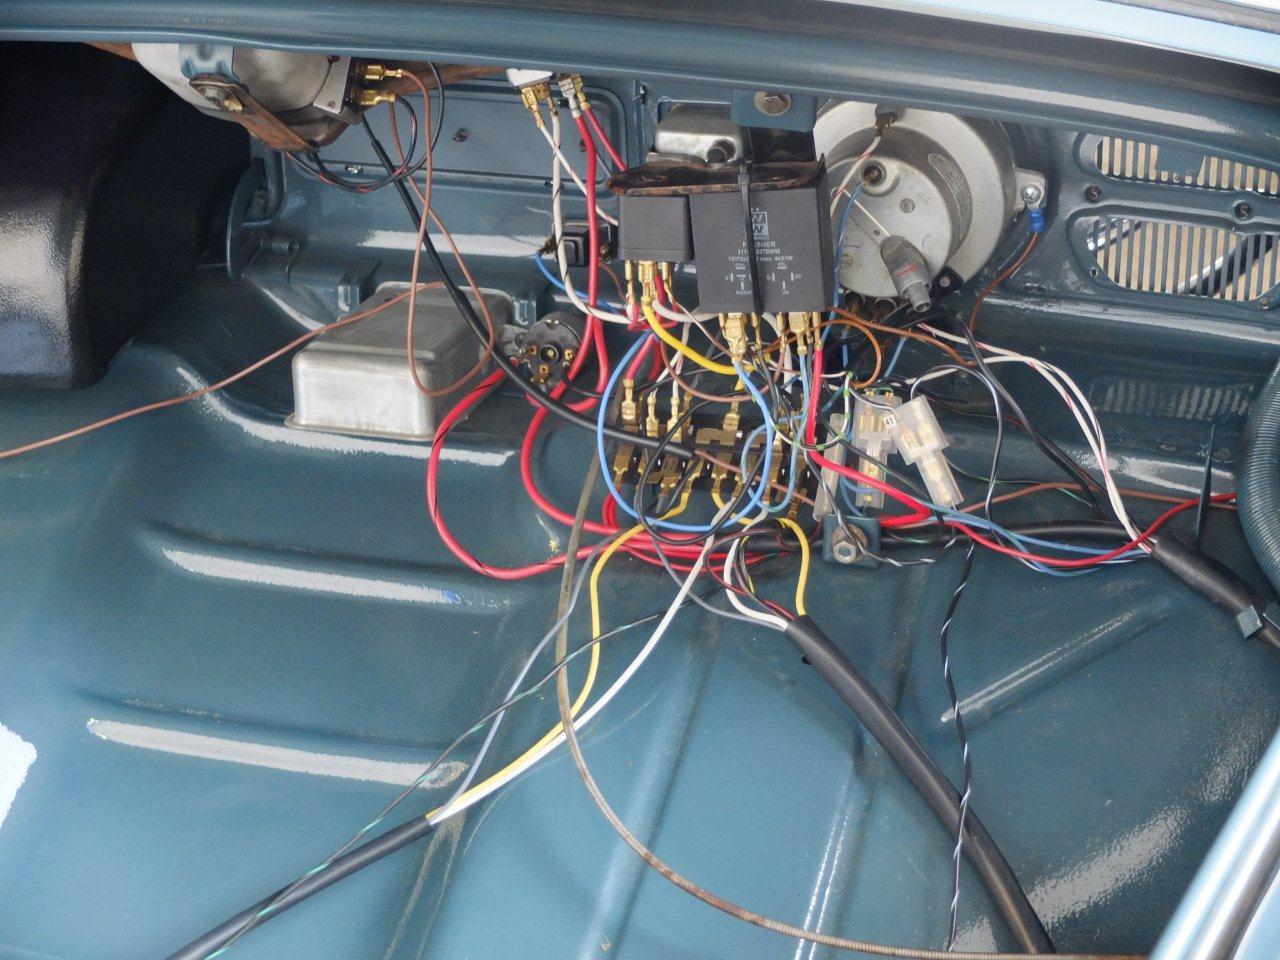 Superb 1971 Vw Bug Wiring Harness Basic Electronics Wiring Diagram Wiring Cloud Itislusmarecoveryedborg